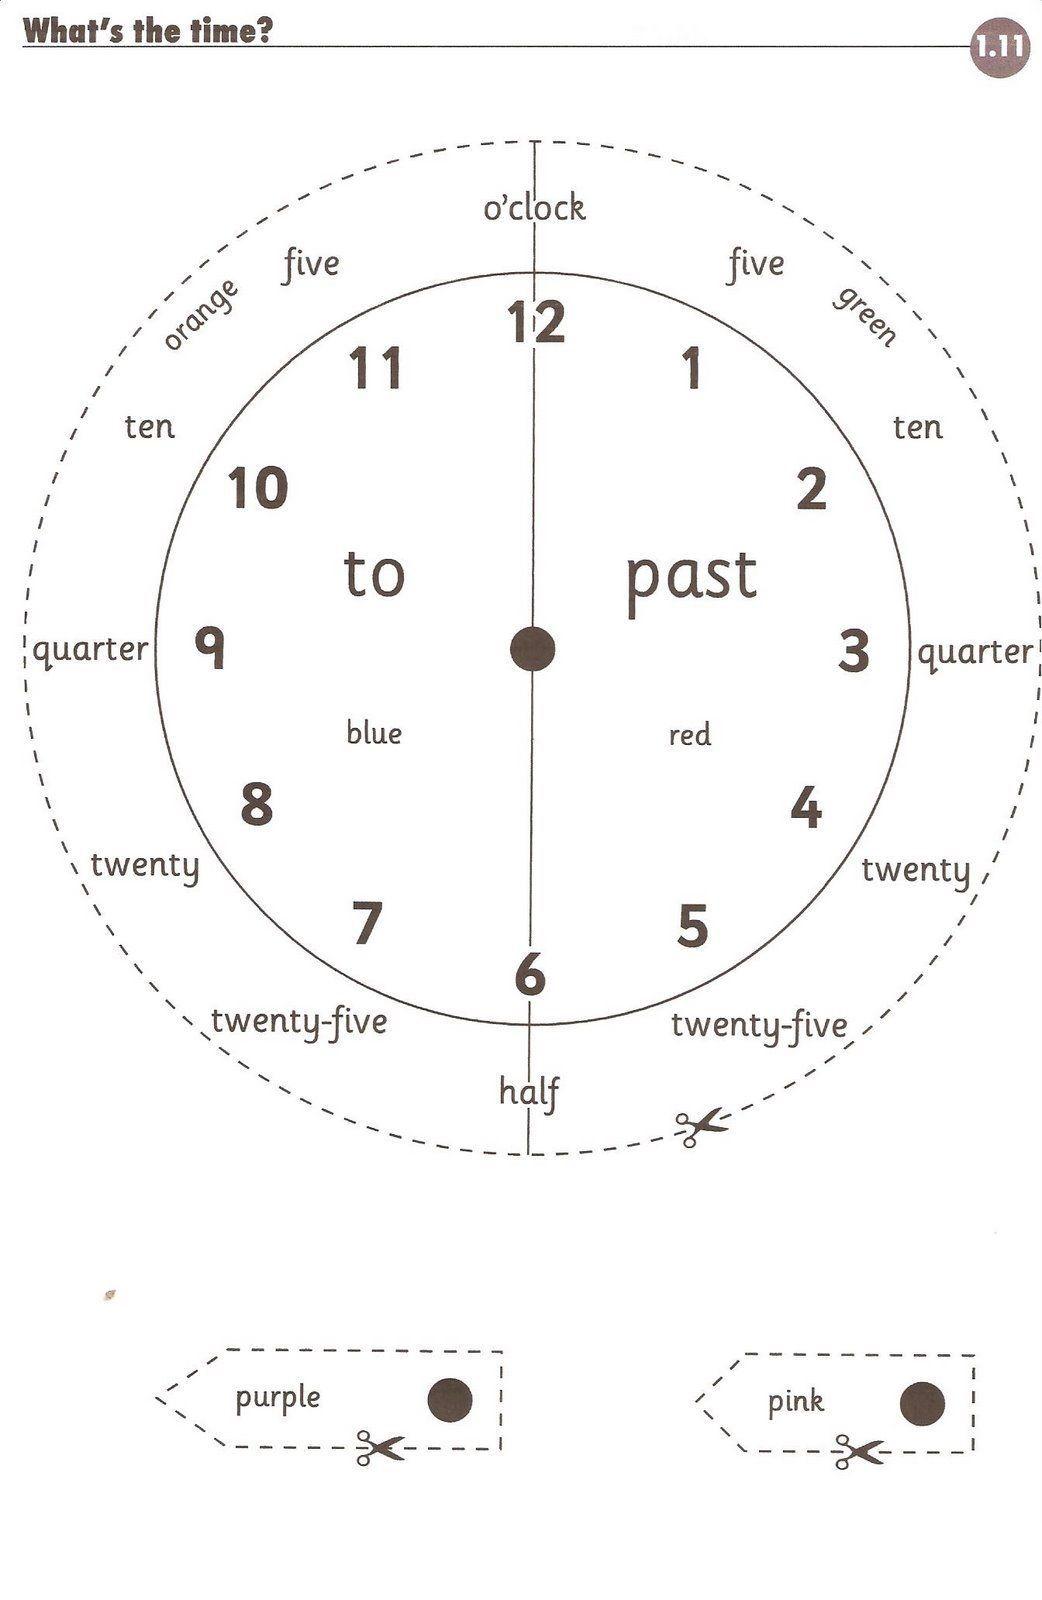 Free Elapsed Time Worksheets Printable Shelter In 2020 Kids Math Worksheets 1st Grade Math Worksheets Time Worksheets